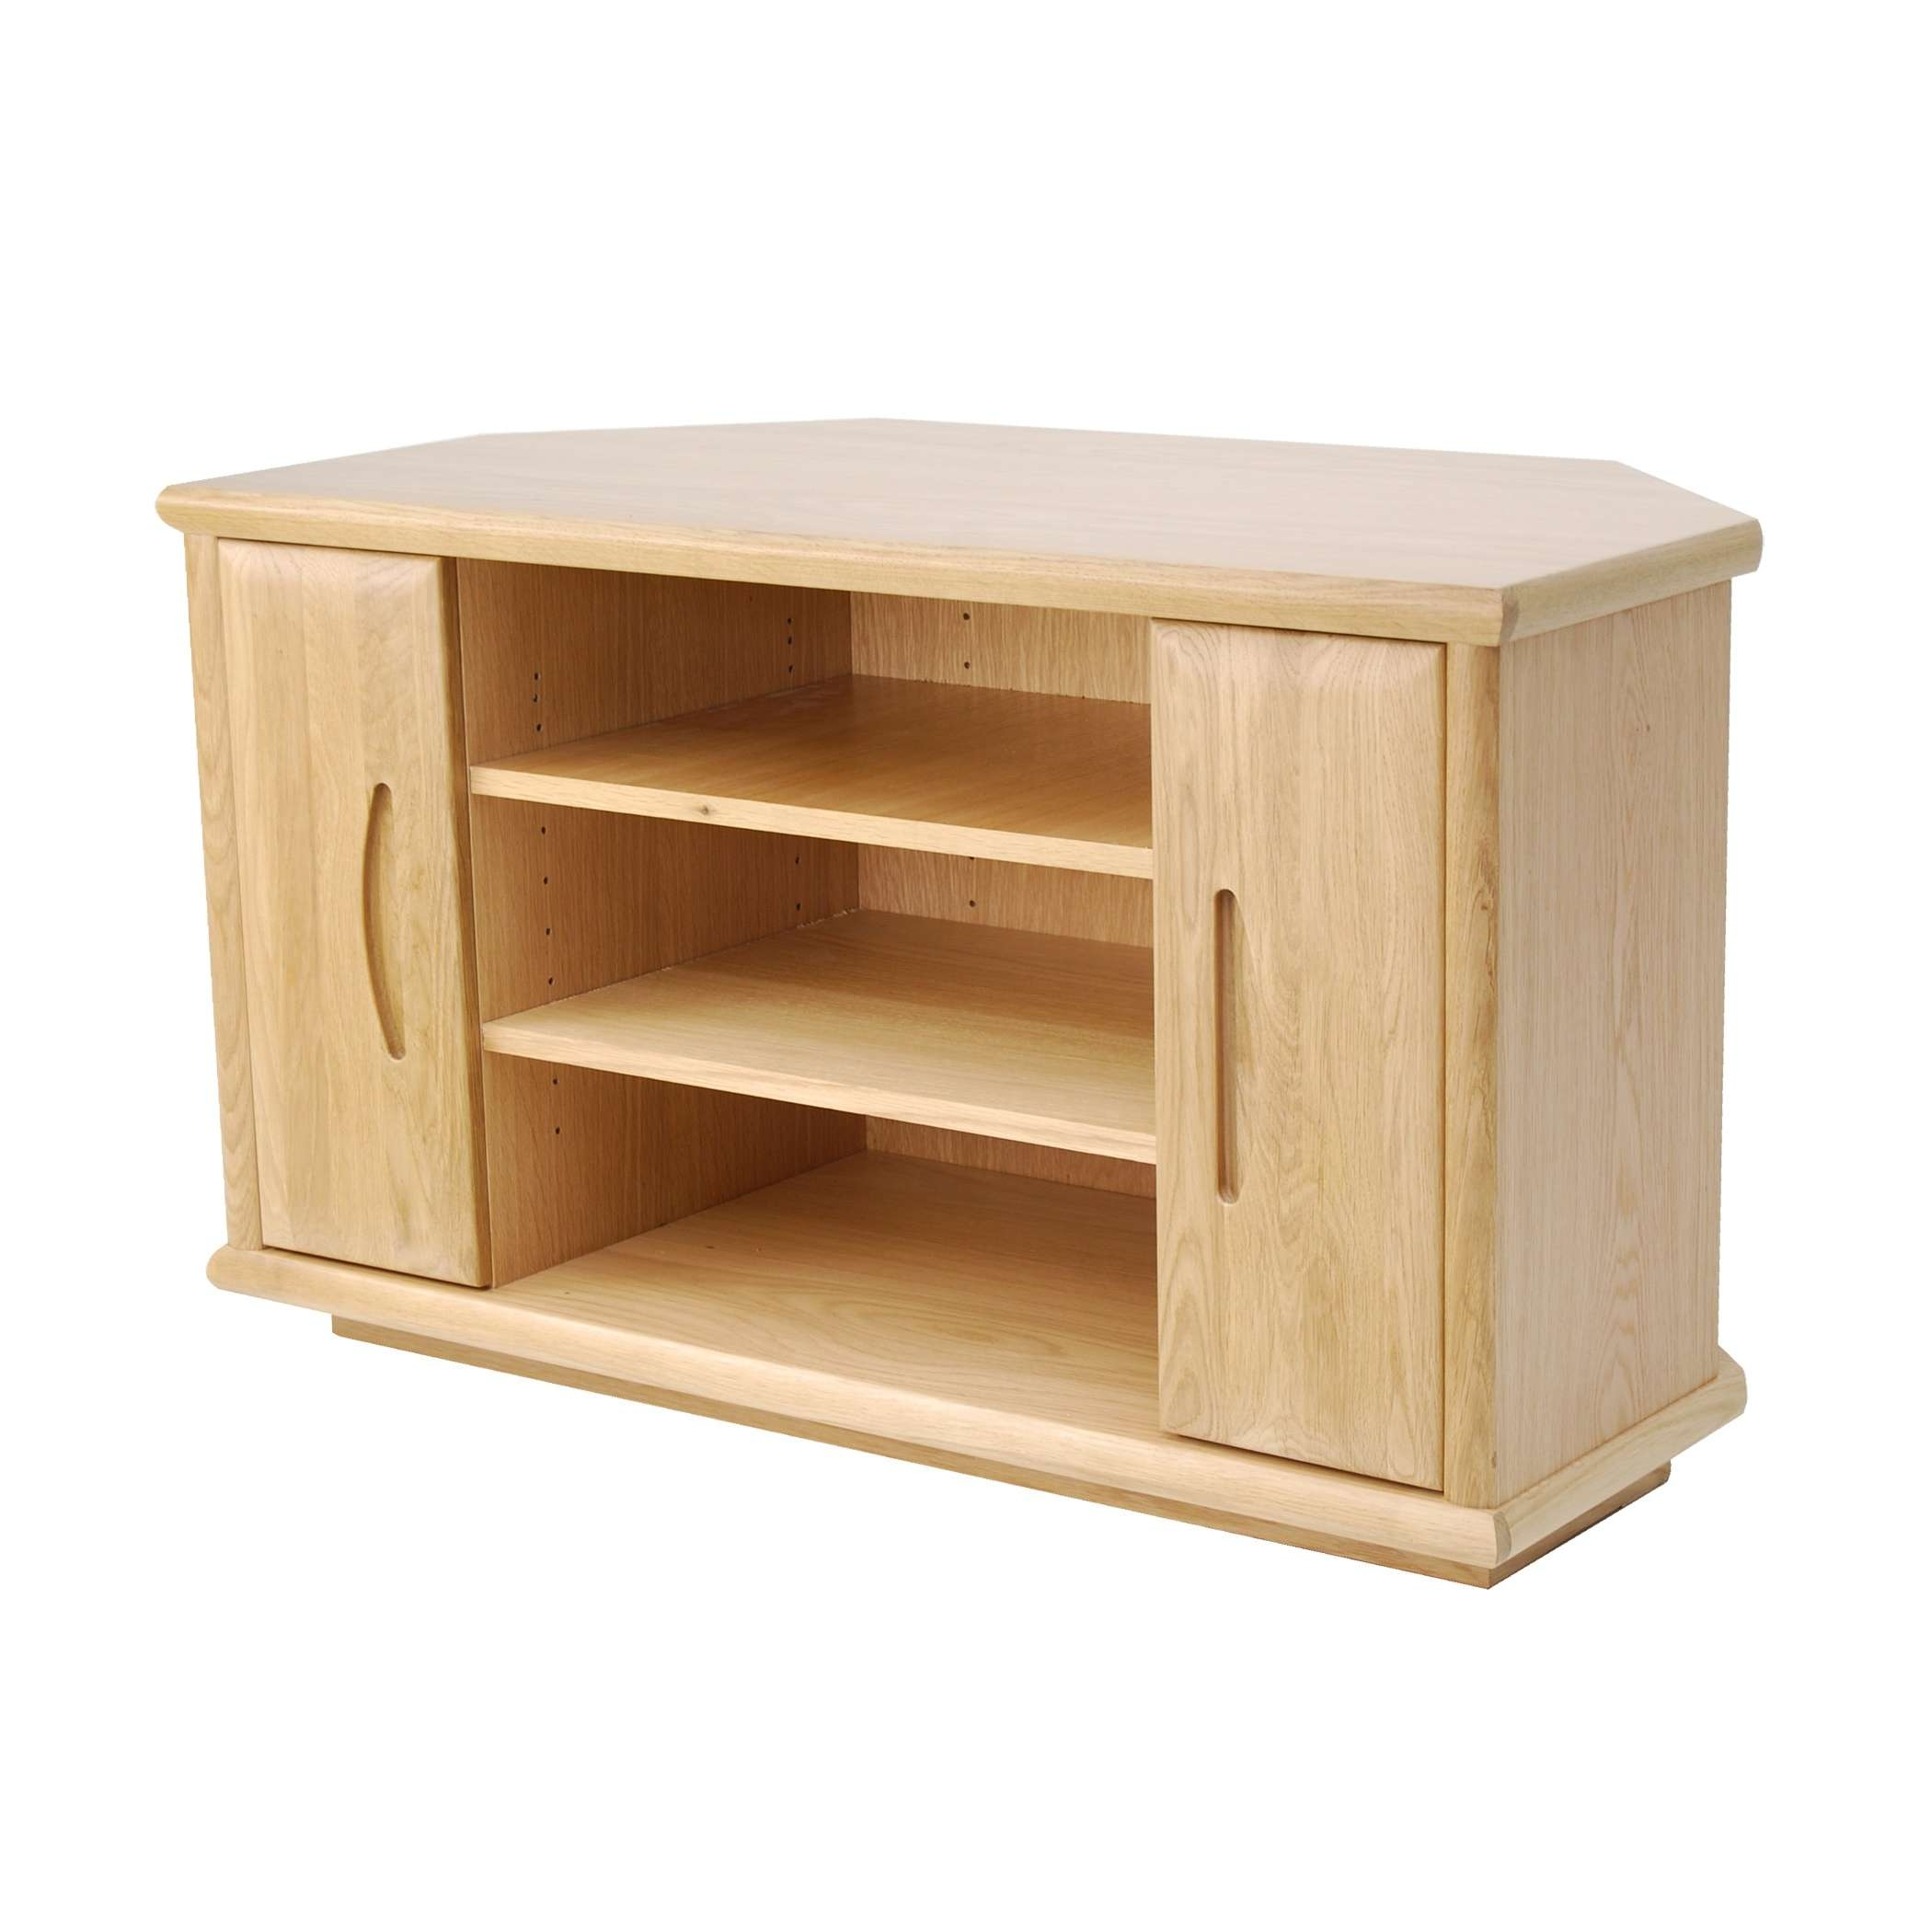 Oak Corner Tv Stand | Gola Furniture Uk Intended For Small Oak Corner Tv Stands (View 2 of 15)